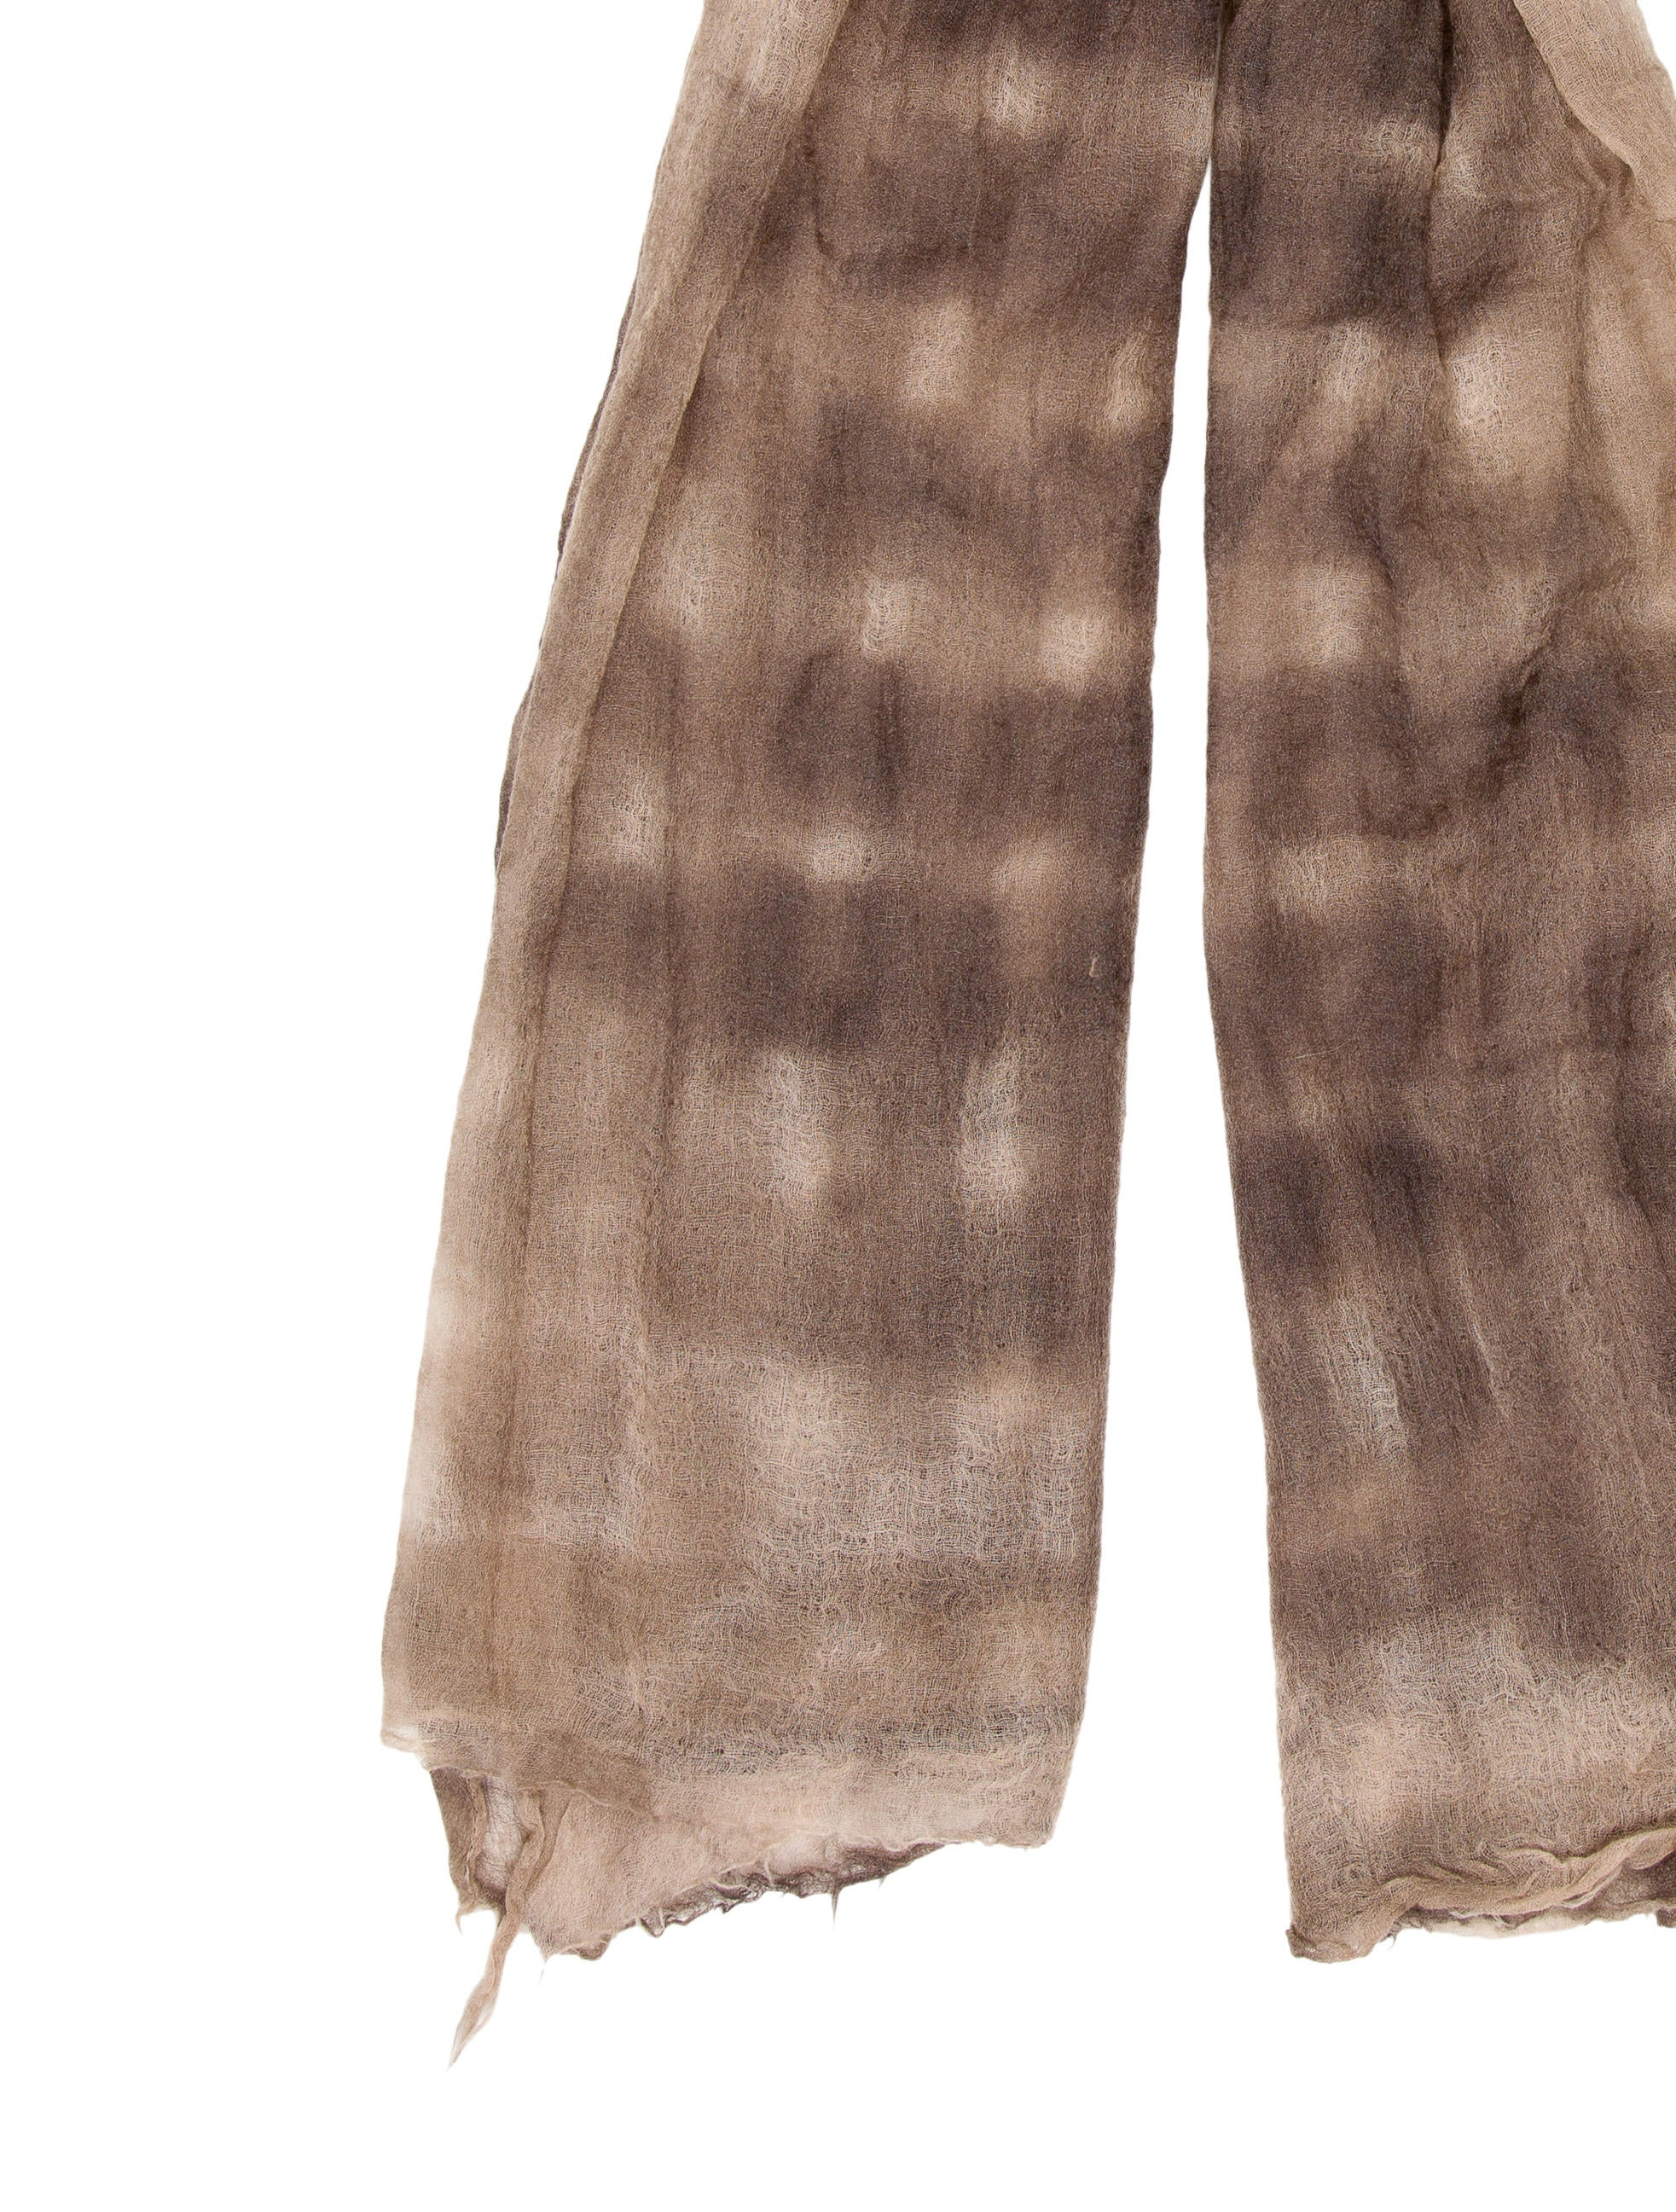 Open Knit Scarf Pattern : Brunello Cucinelli Cashmere Open Knit Scarf - Accessories - BRU41381 The Re...